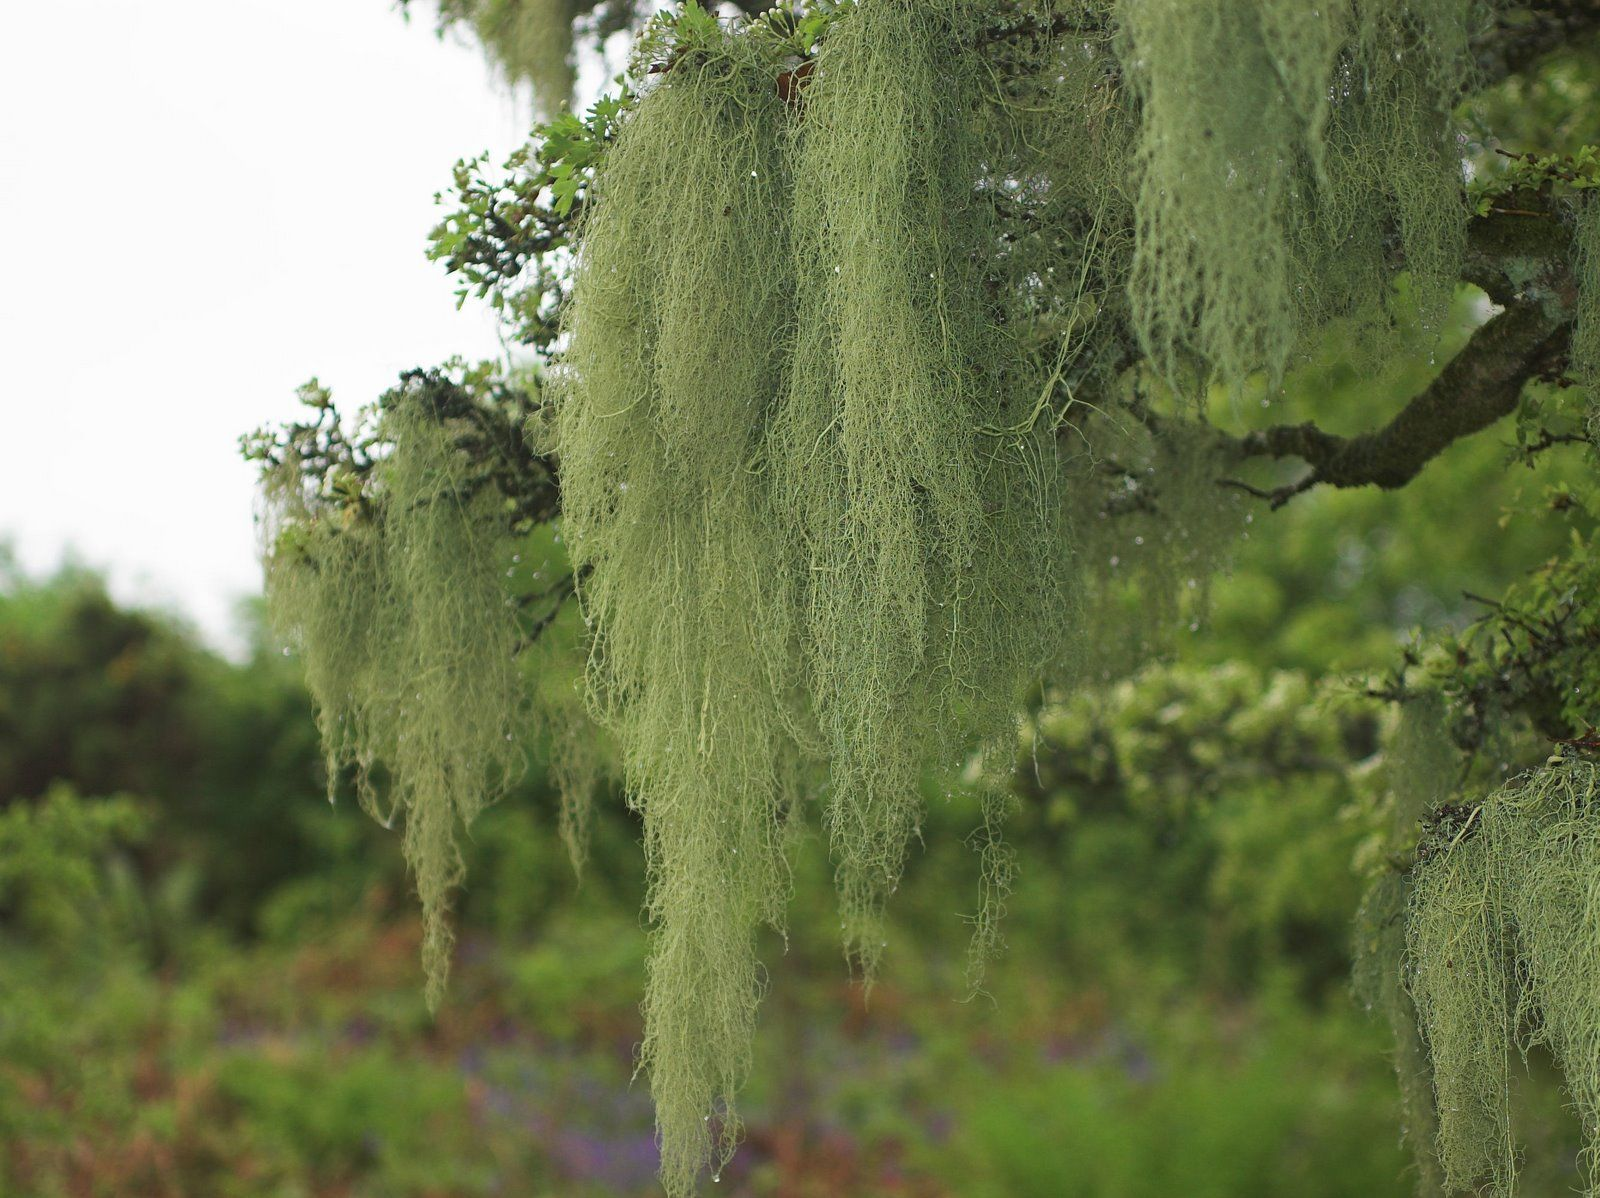 USNEA BARBATA | Herbs | Pinterest | Homeopathic remedies, Air pollution and Homeopathy